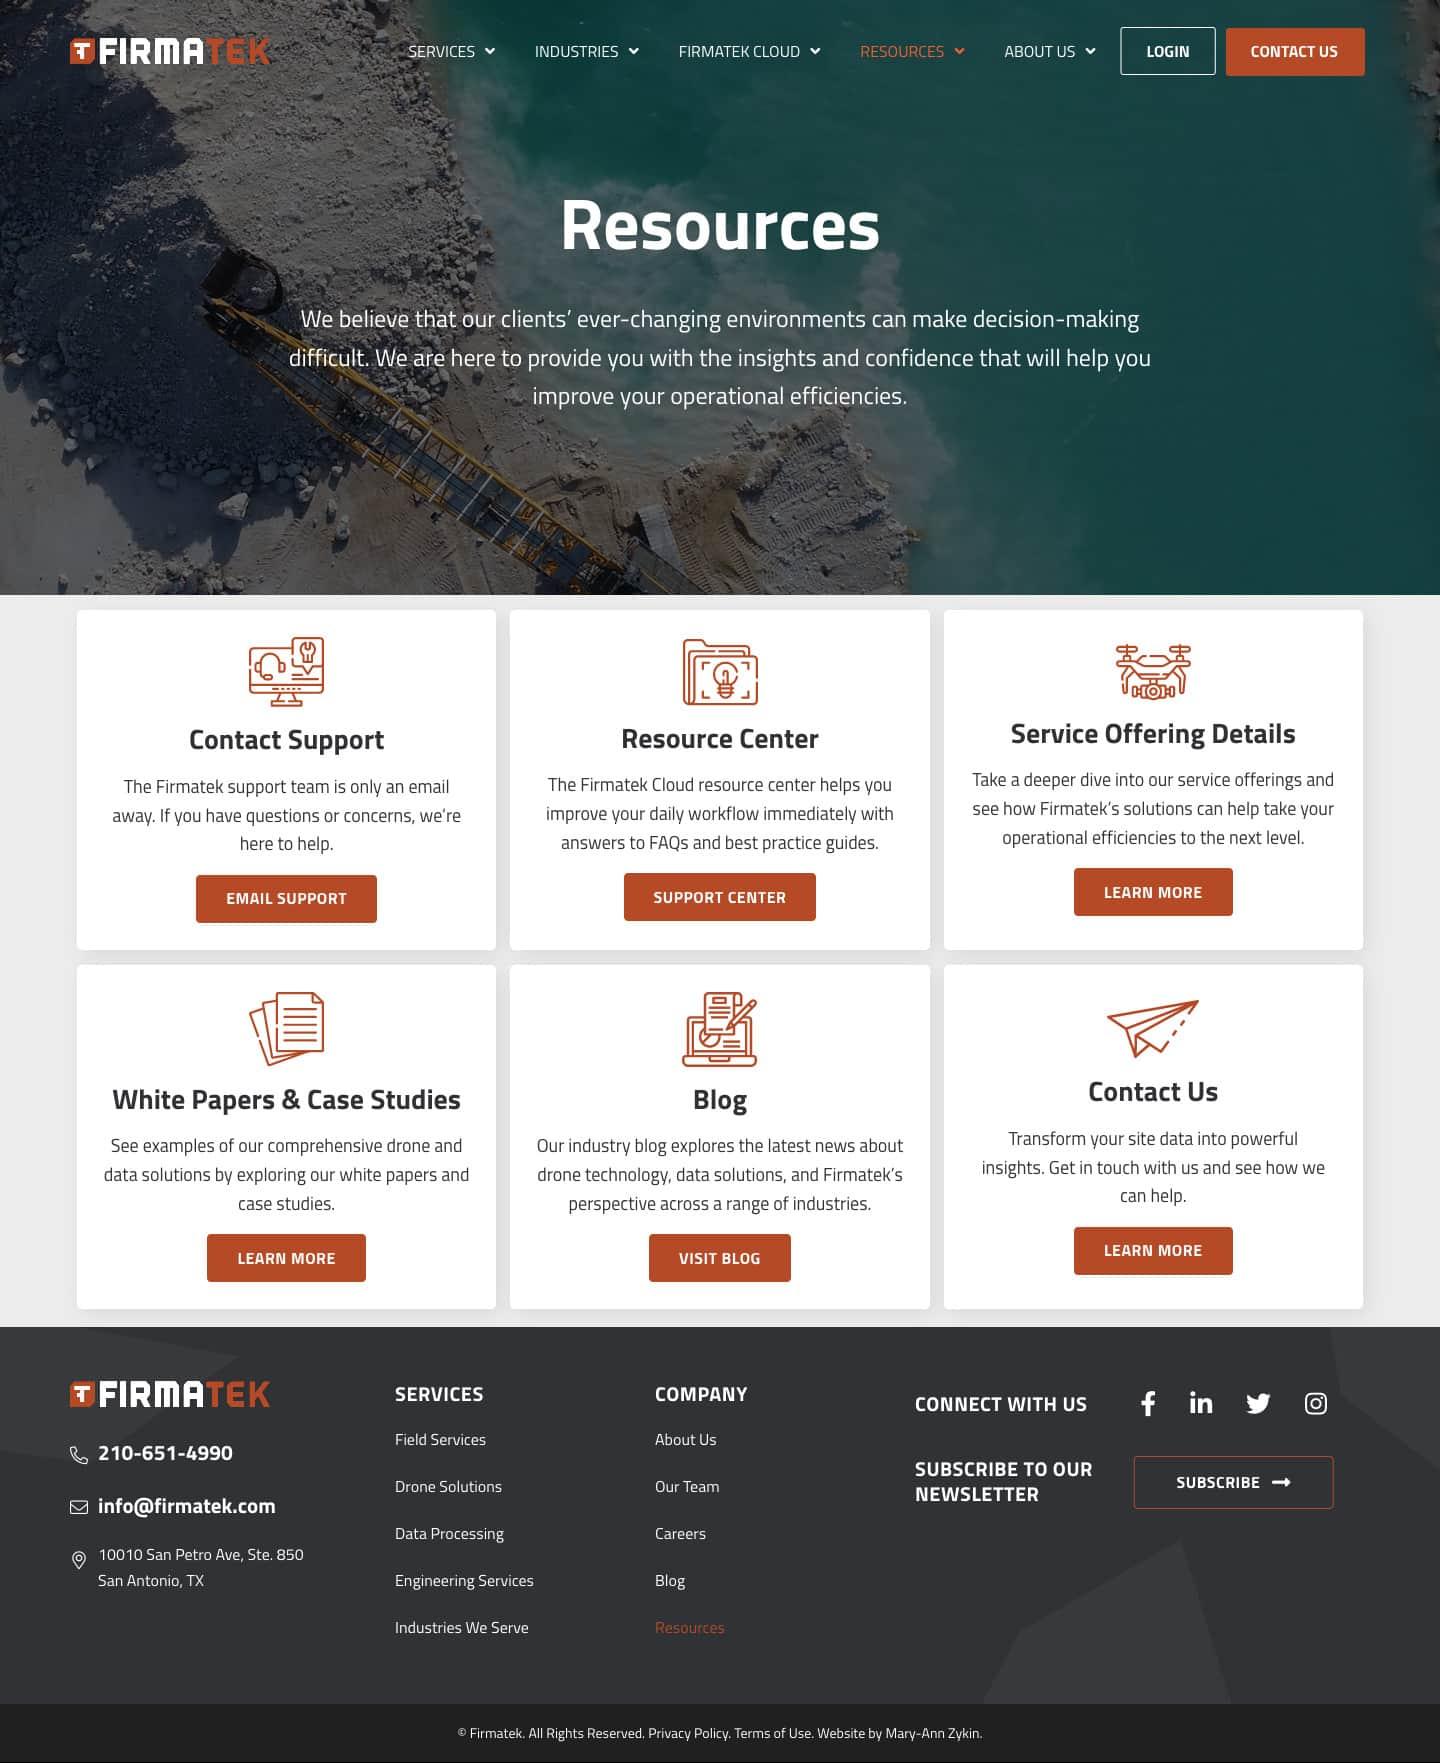 Firmatek Resources Page